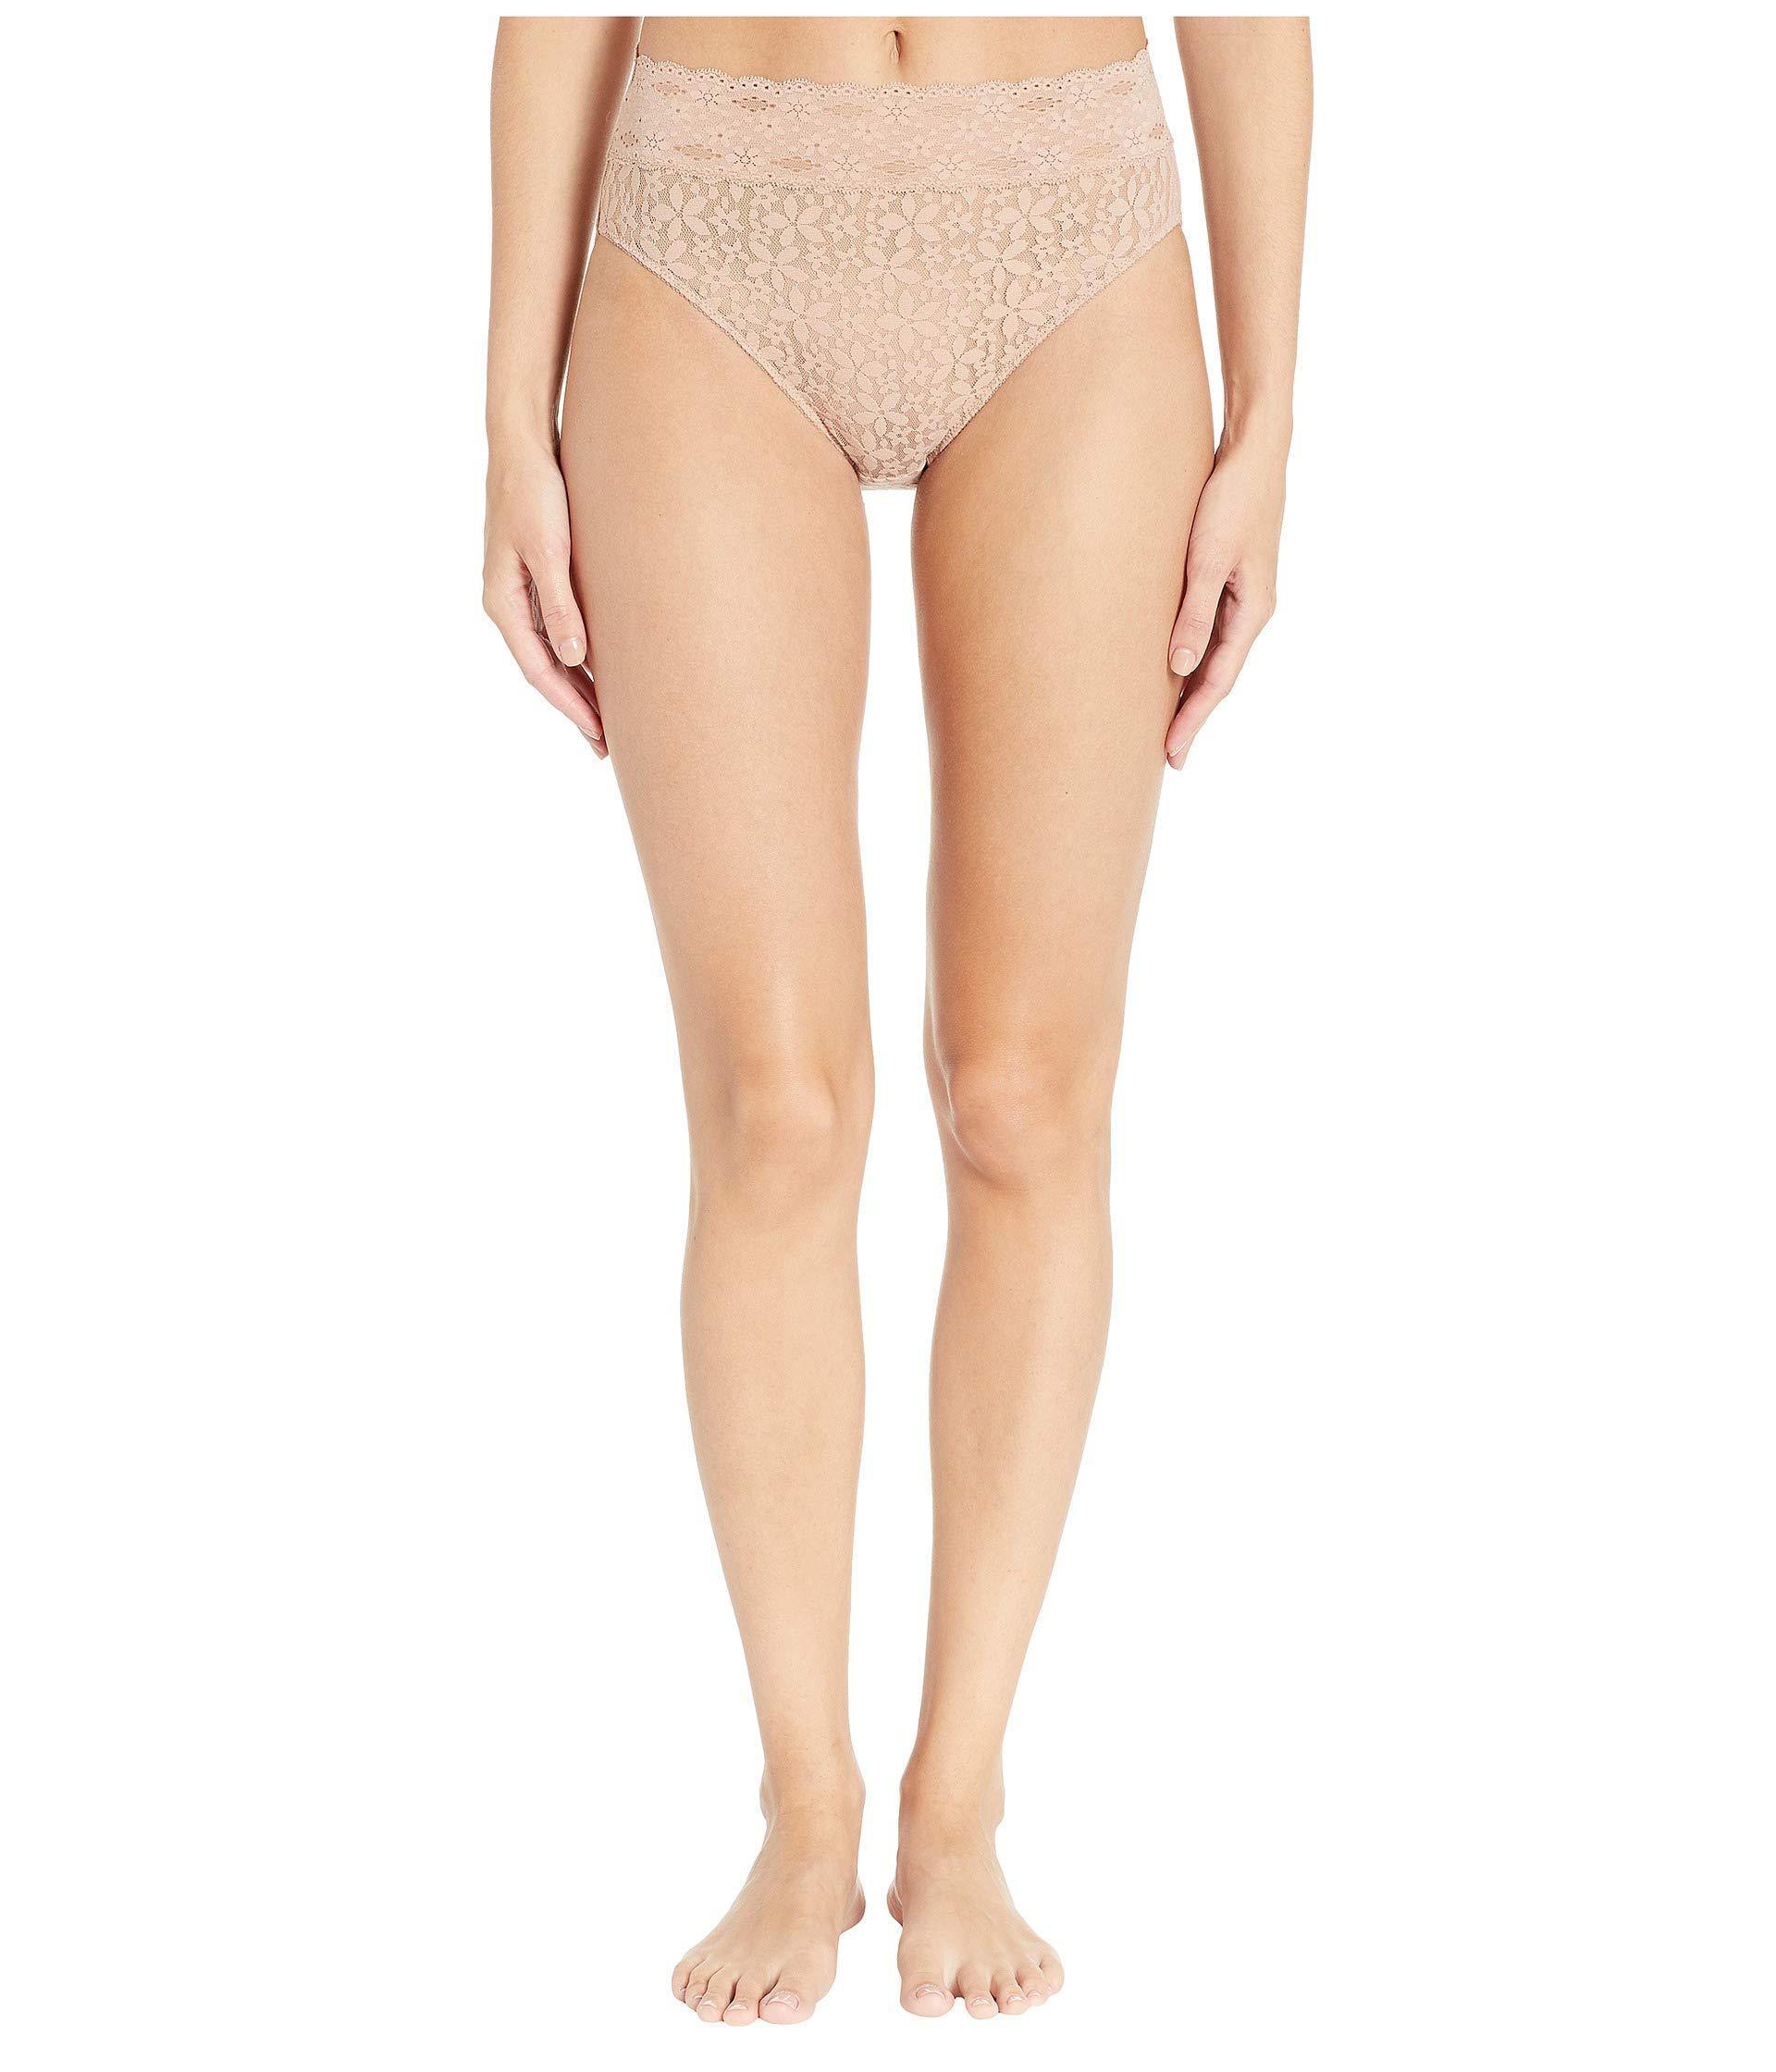 5968fc51a5 Lyst - Wacoal Halo Lace Hi-cut Brief (black) Women s Underwear